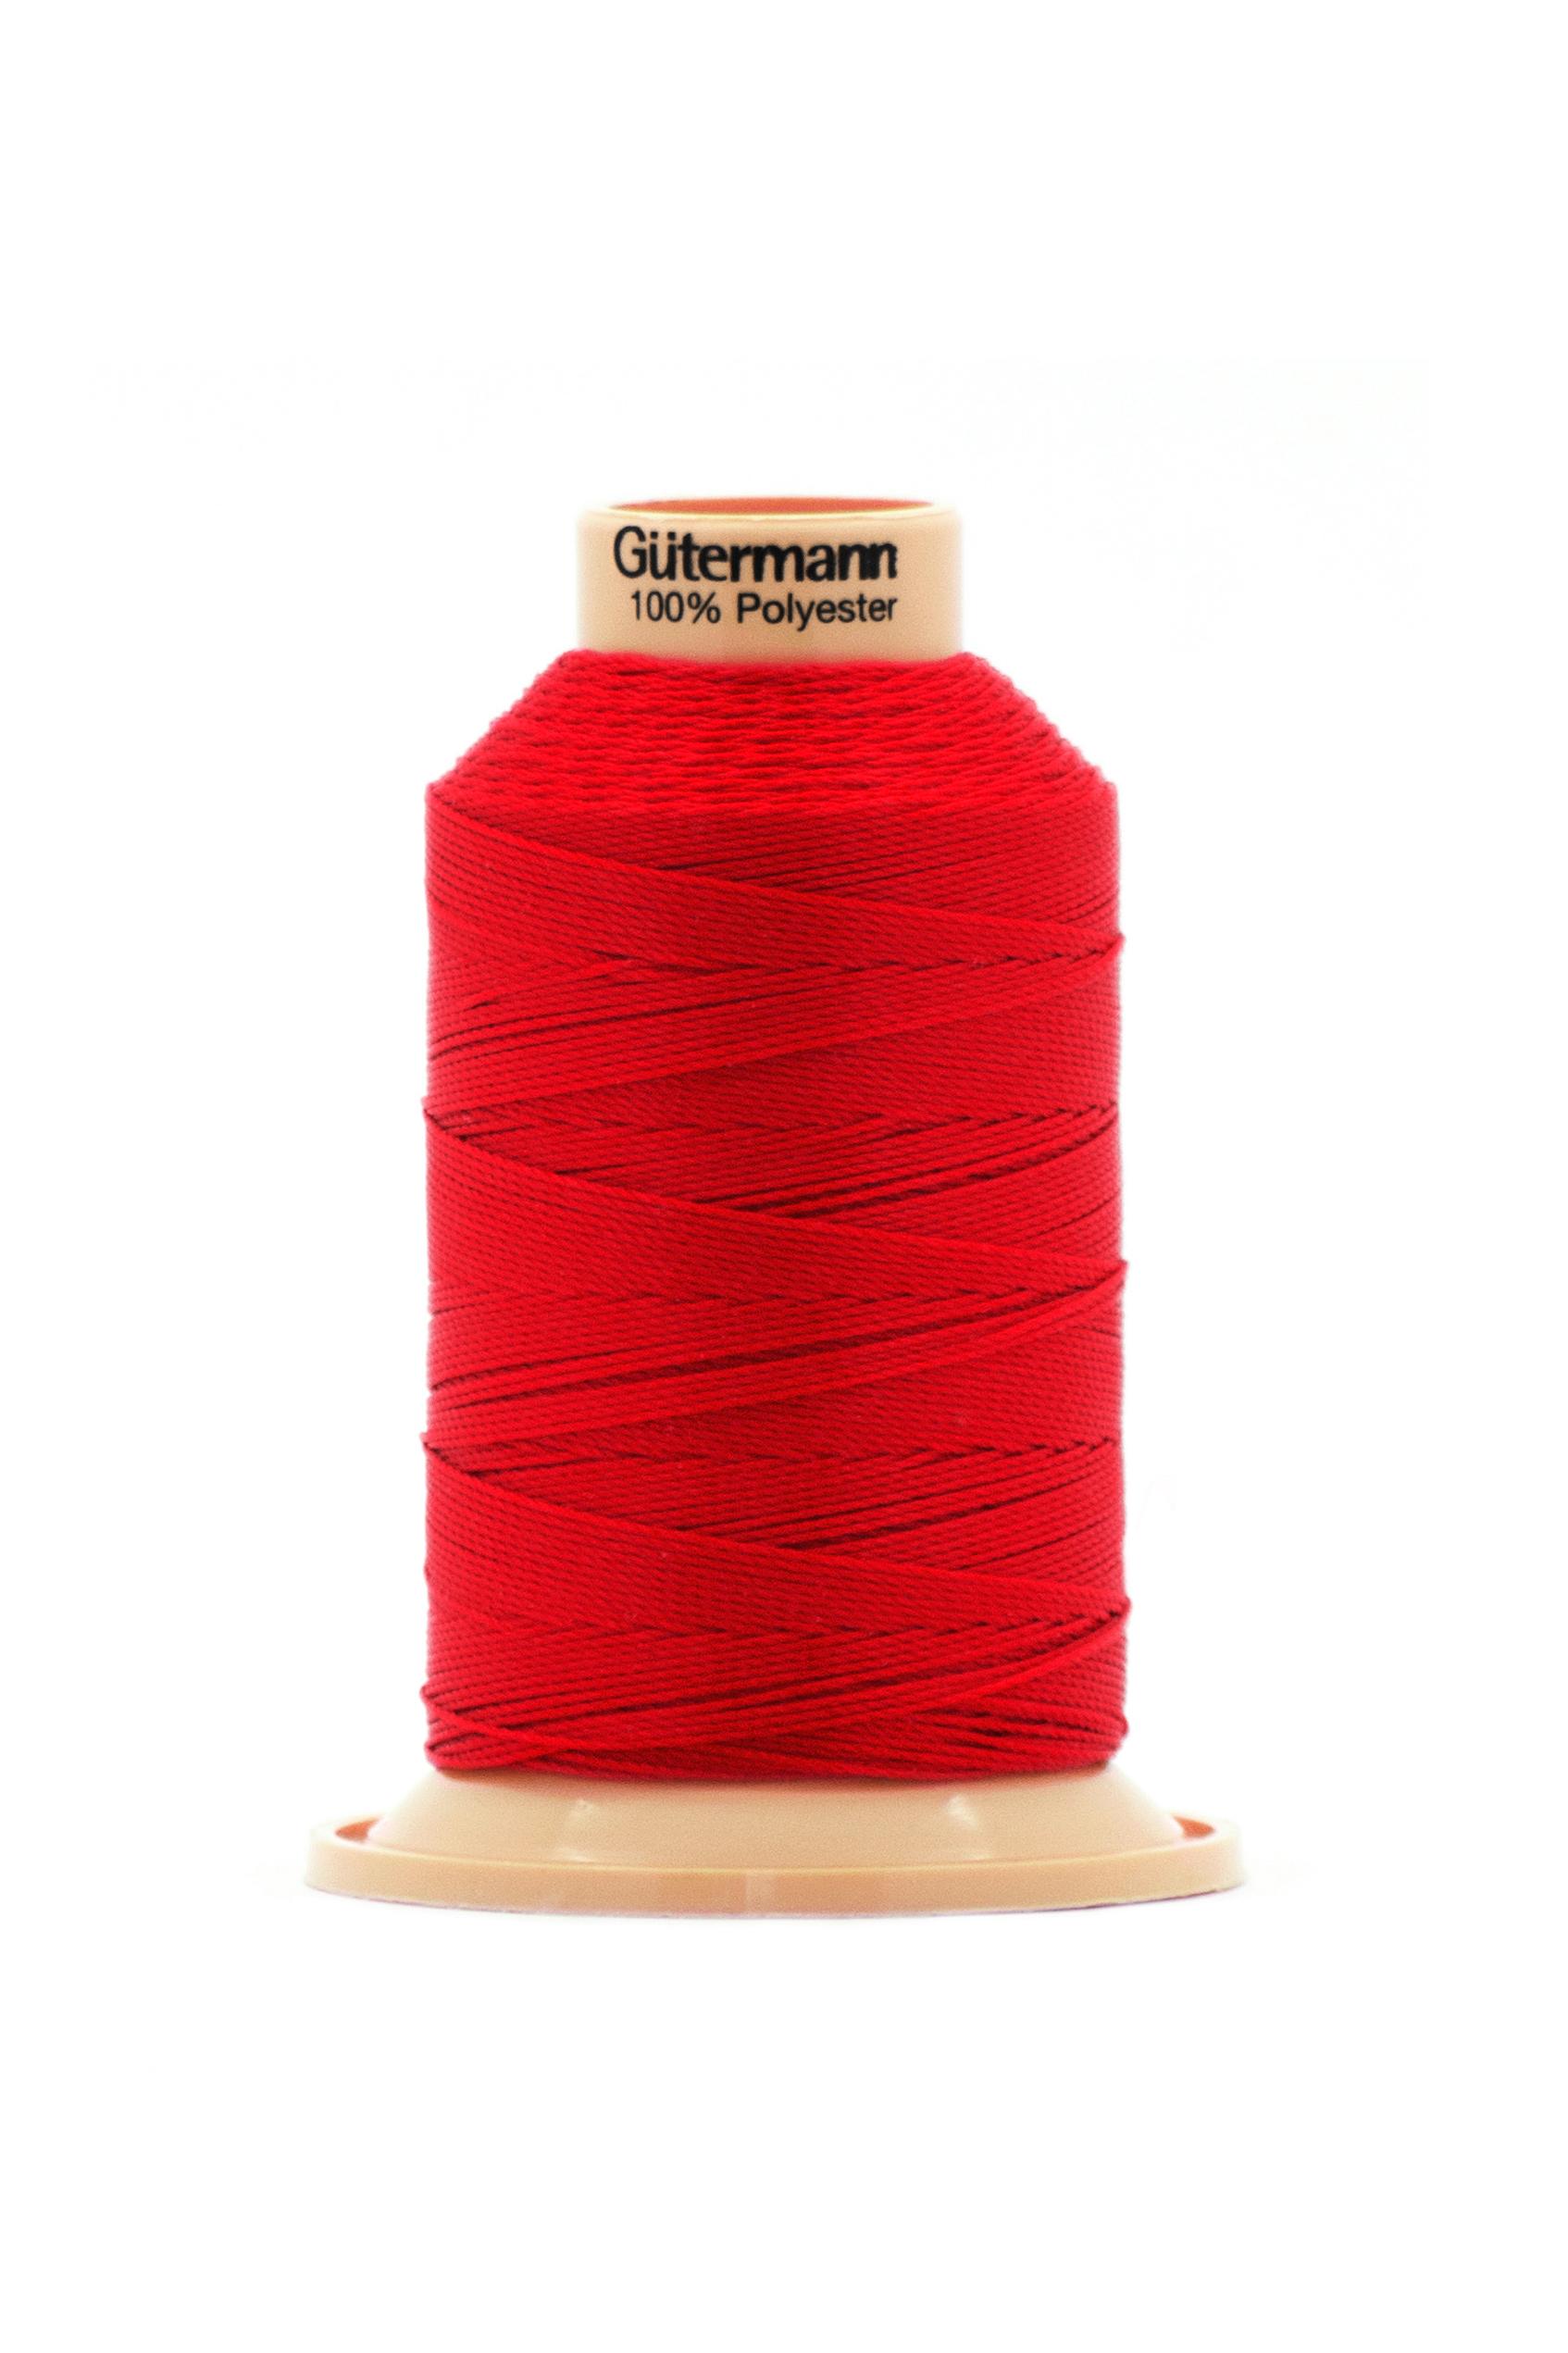 Gutermann нитки terra 20 купить ткани недорого сочи